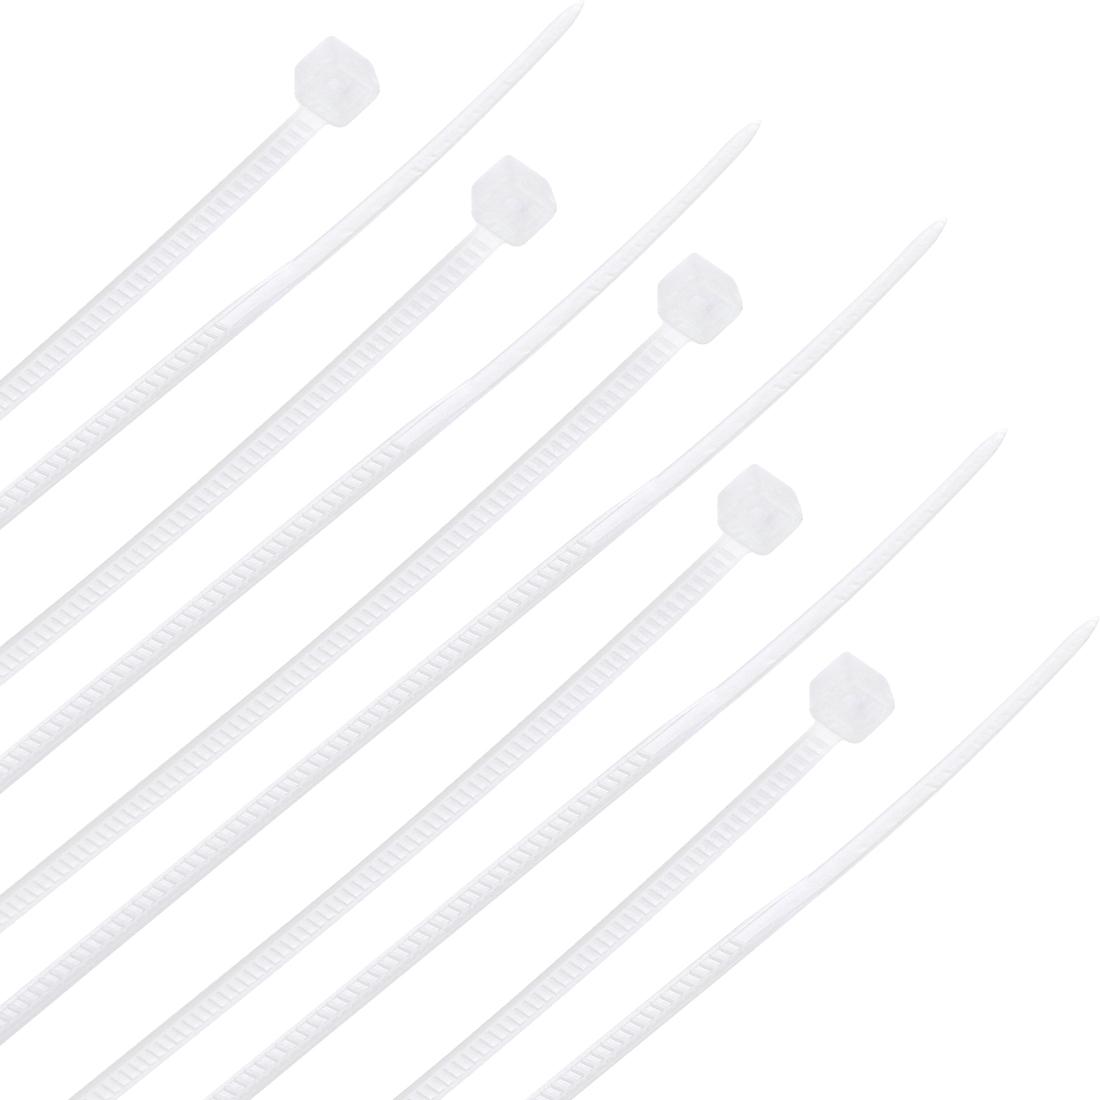 Cable Zip Ties 100mmx1.8mm Self-Locking Nylon Tie Wraps White 700pcs